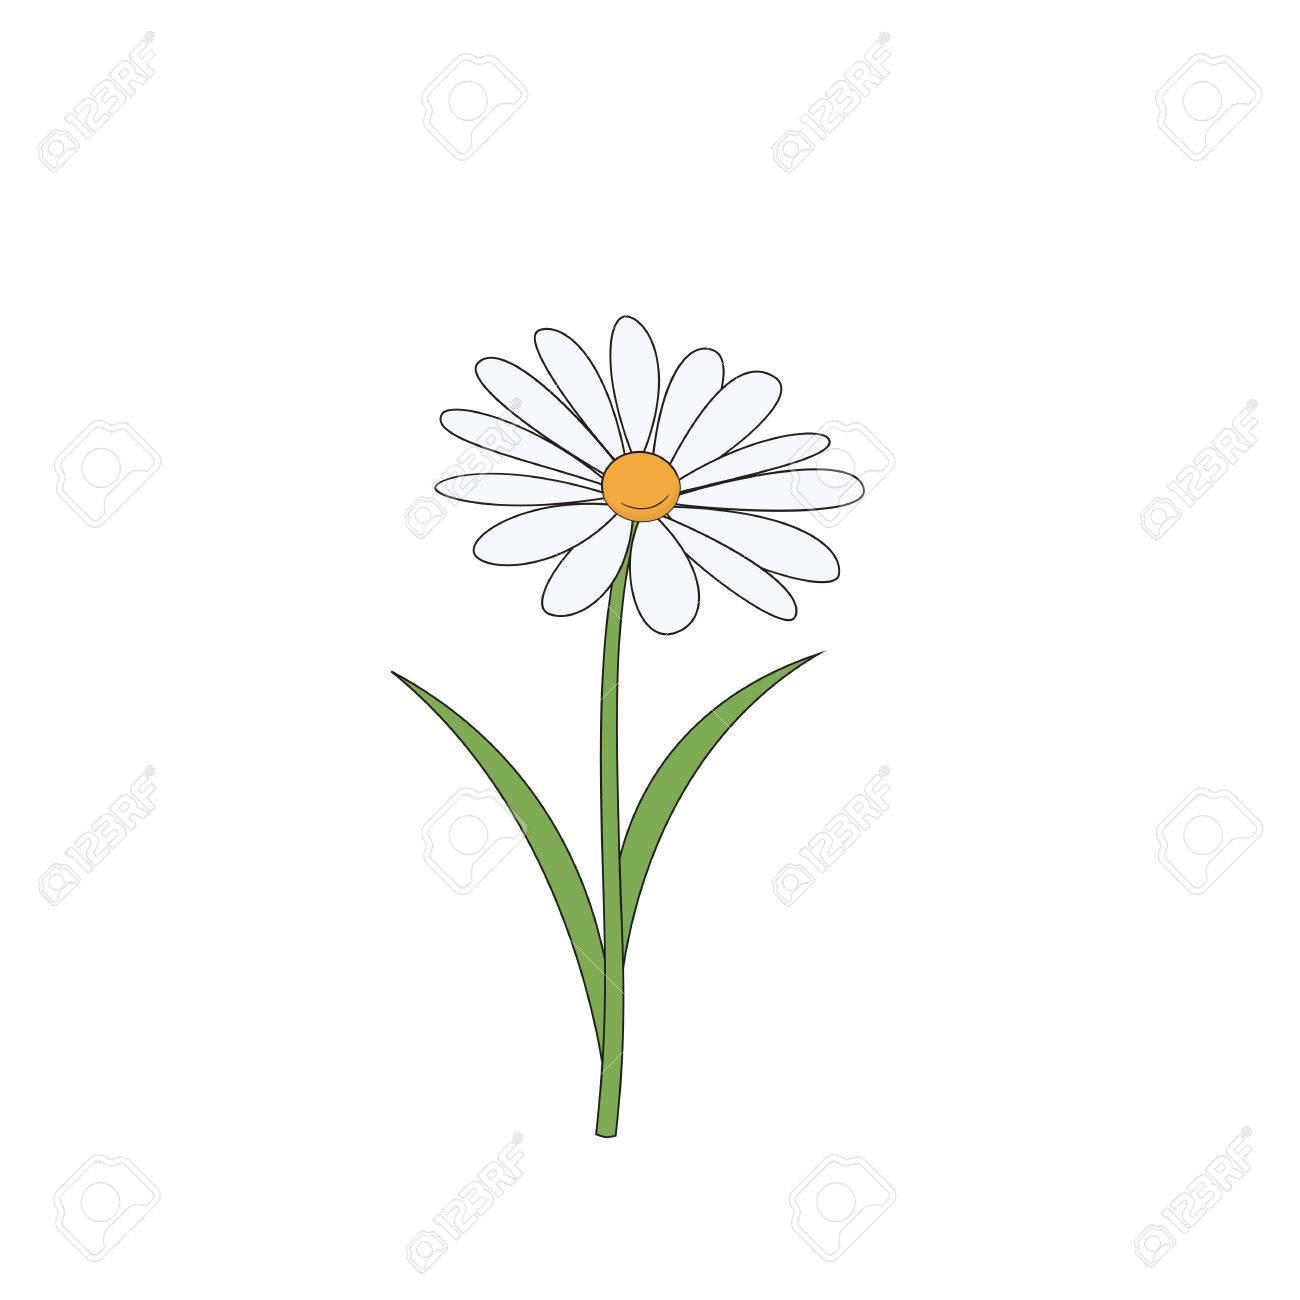 hight resolution of cartoon daisy simple flower on white background vector illustration stock vector 76081580